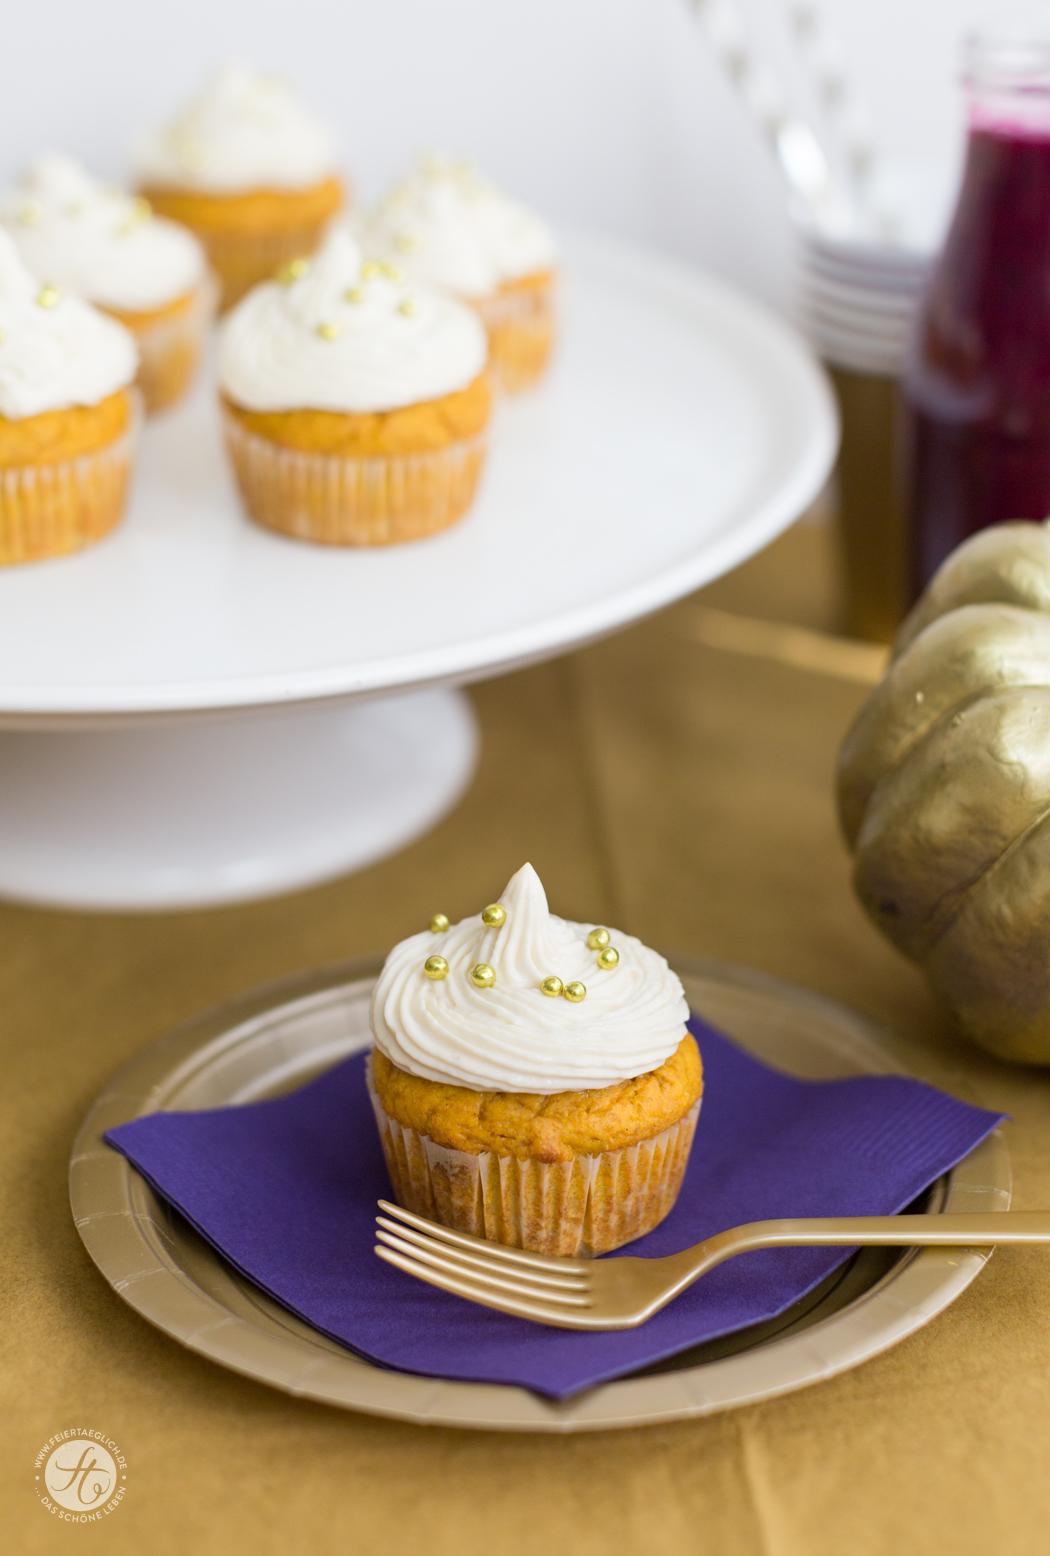 KürbisCupcakes mit Maple-Creamcheese-Frosting